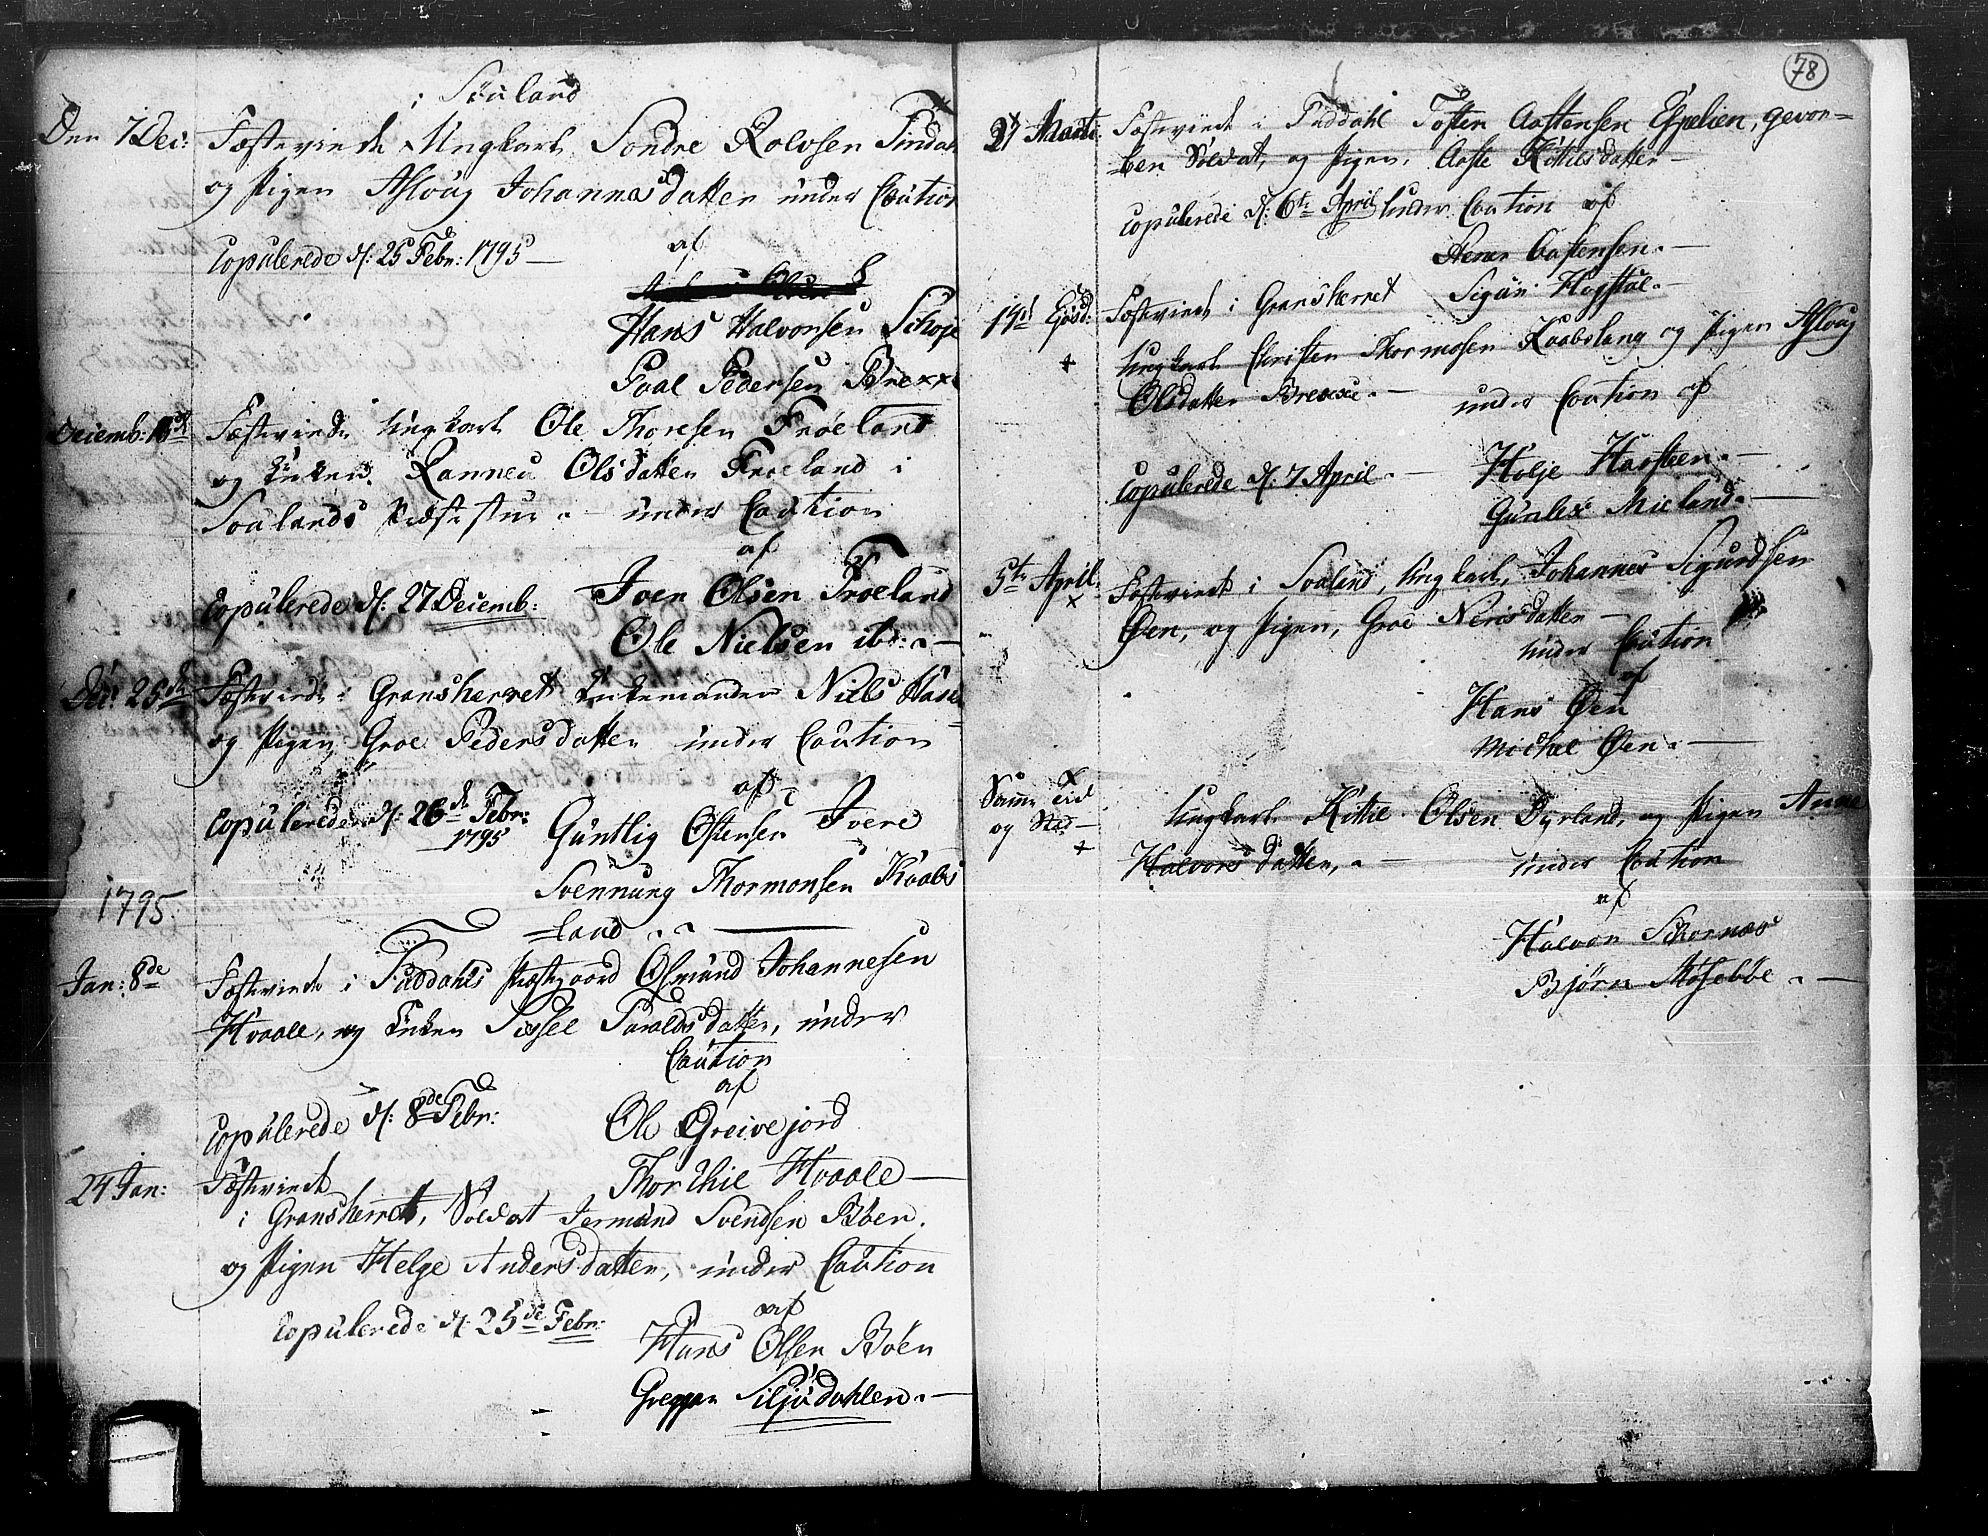 SAKO, Hjartdal kirkebøker, F/Fa/L0004: Ministerialbok nr. I 4, 1727-1795, s. 78